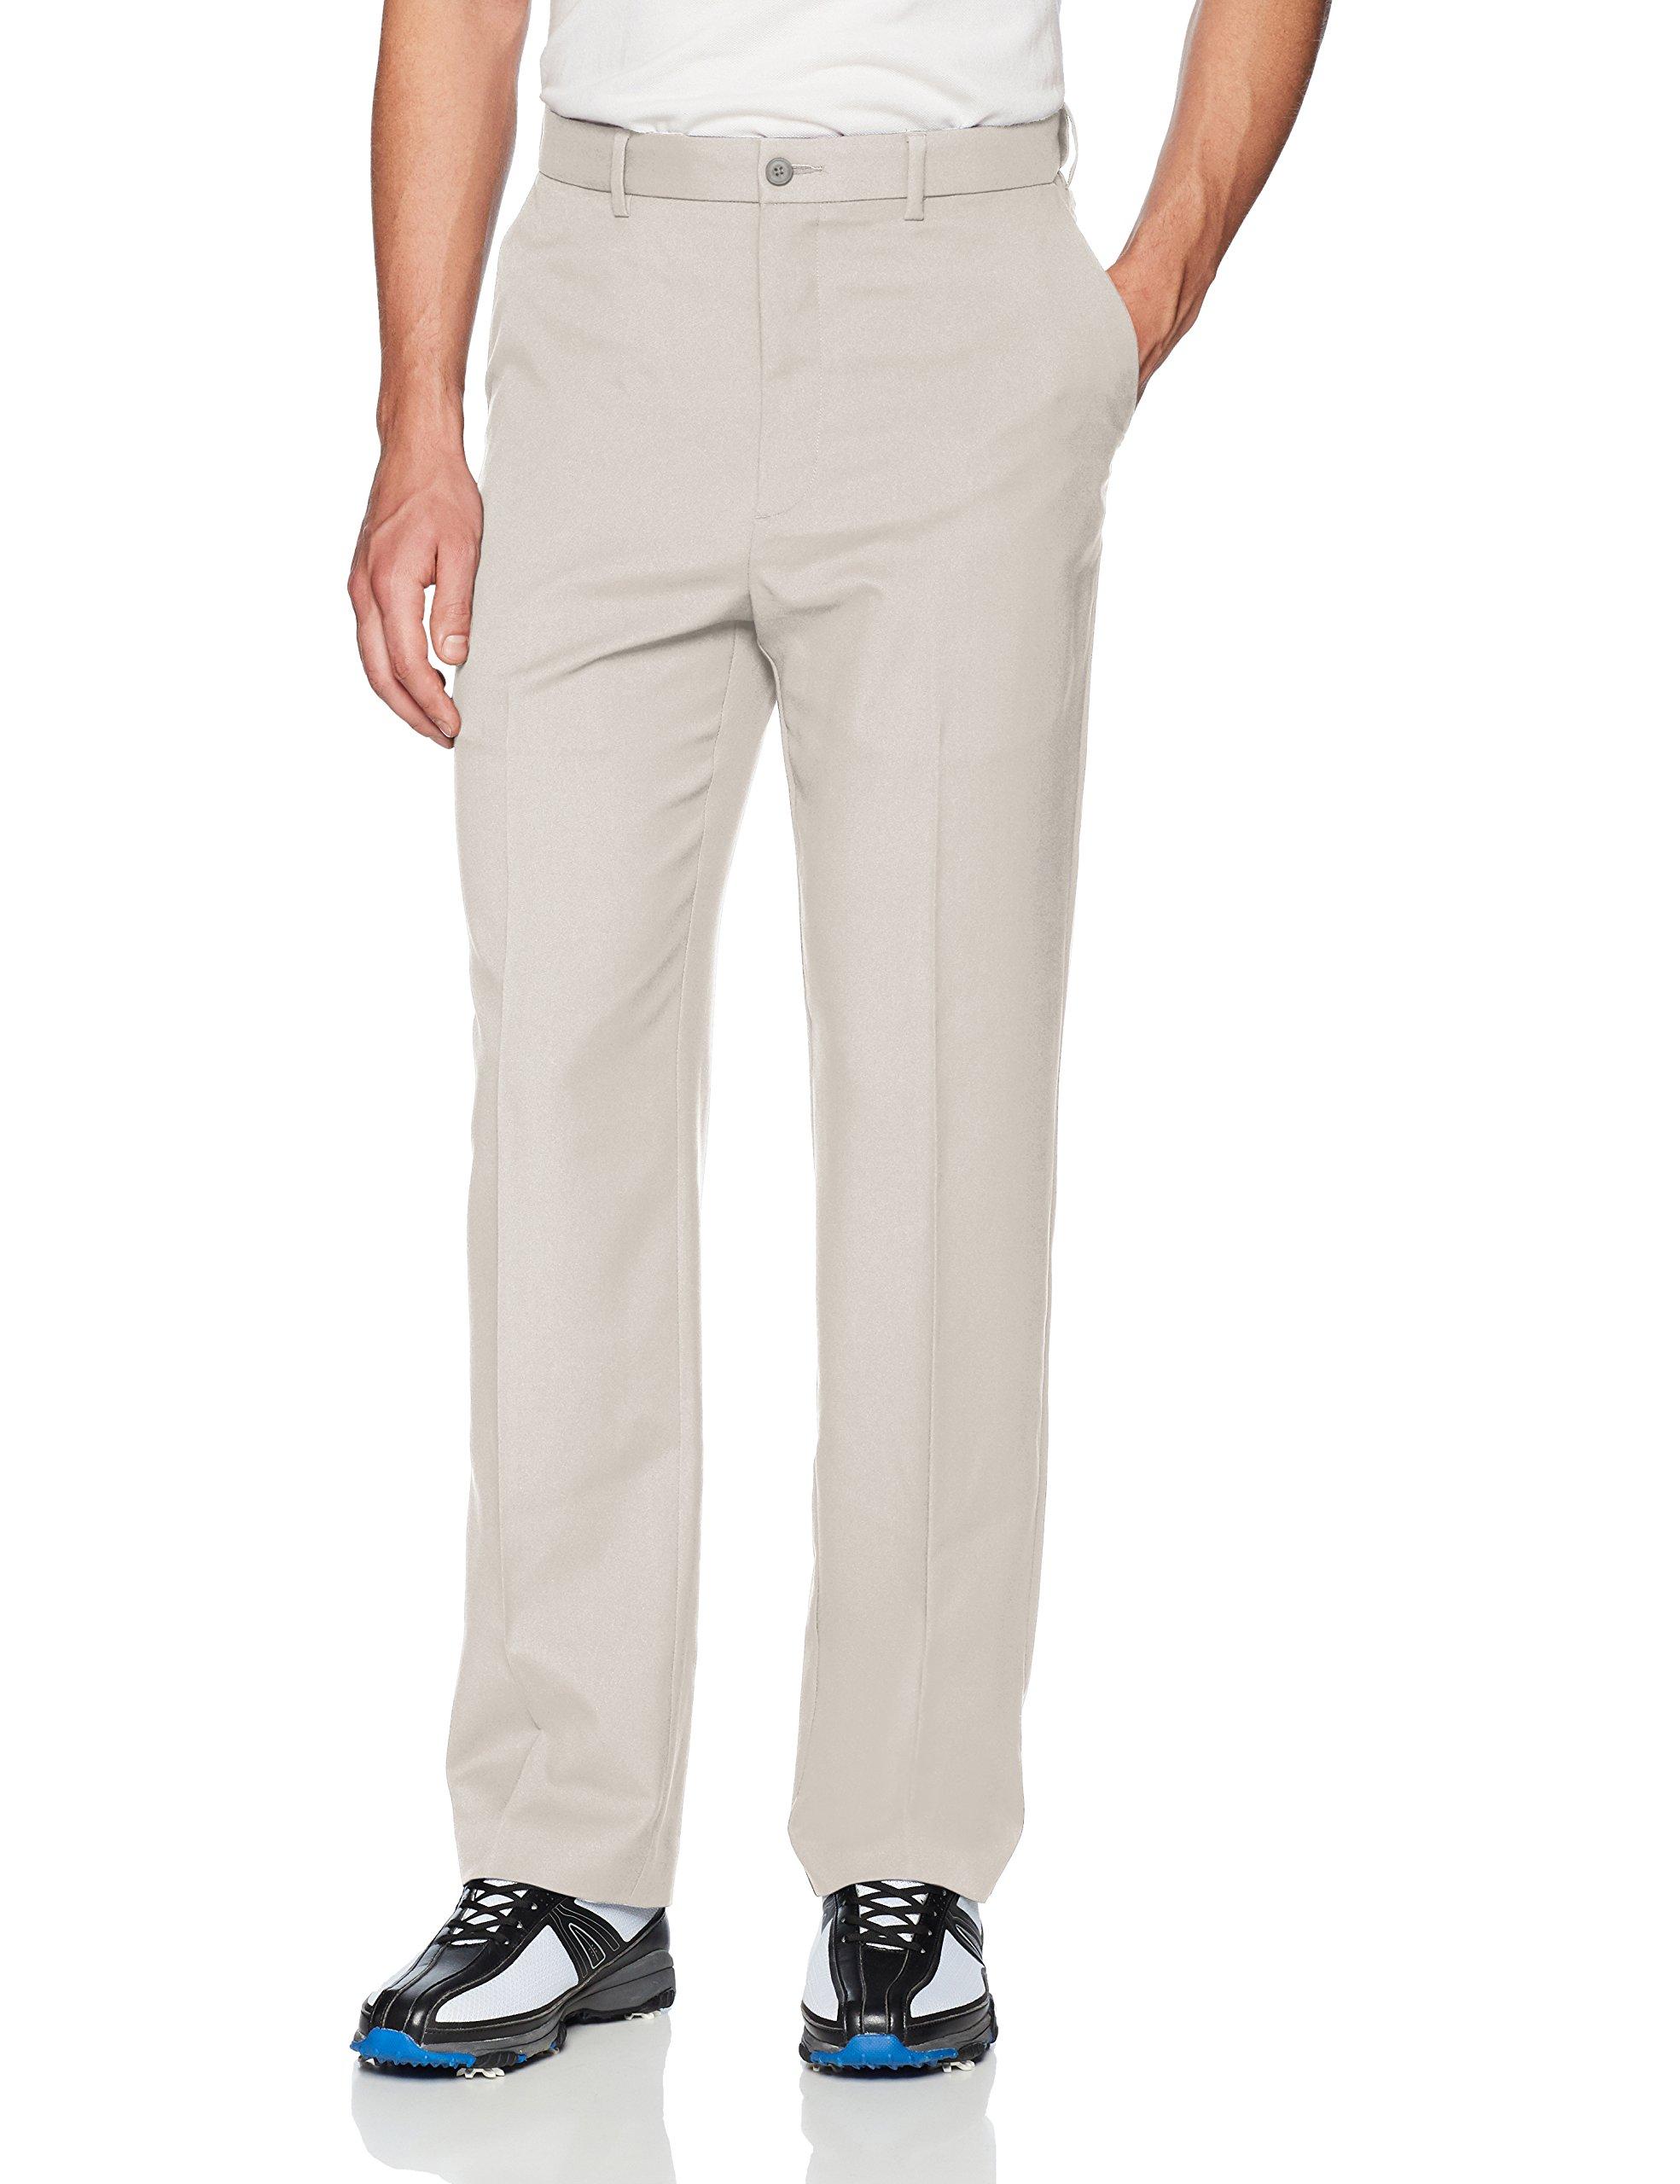 PGA TOUR Men's Flat Front Golf Pant with Expandable Waistband, Silver Cloud, 44W x 32L by PGA TOUR